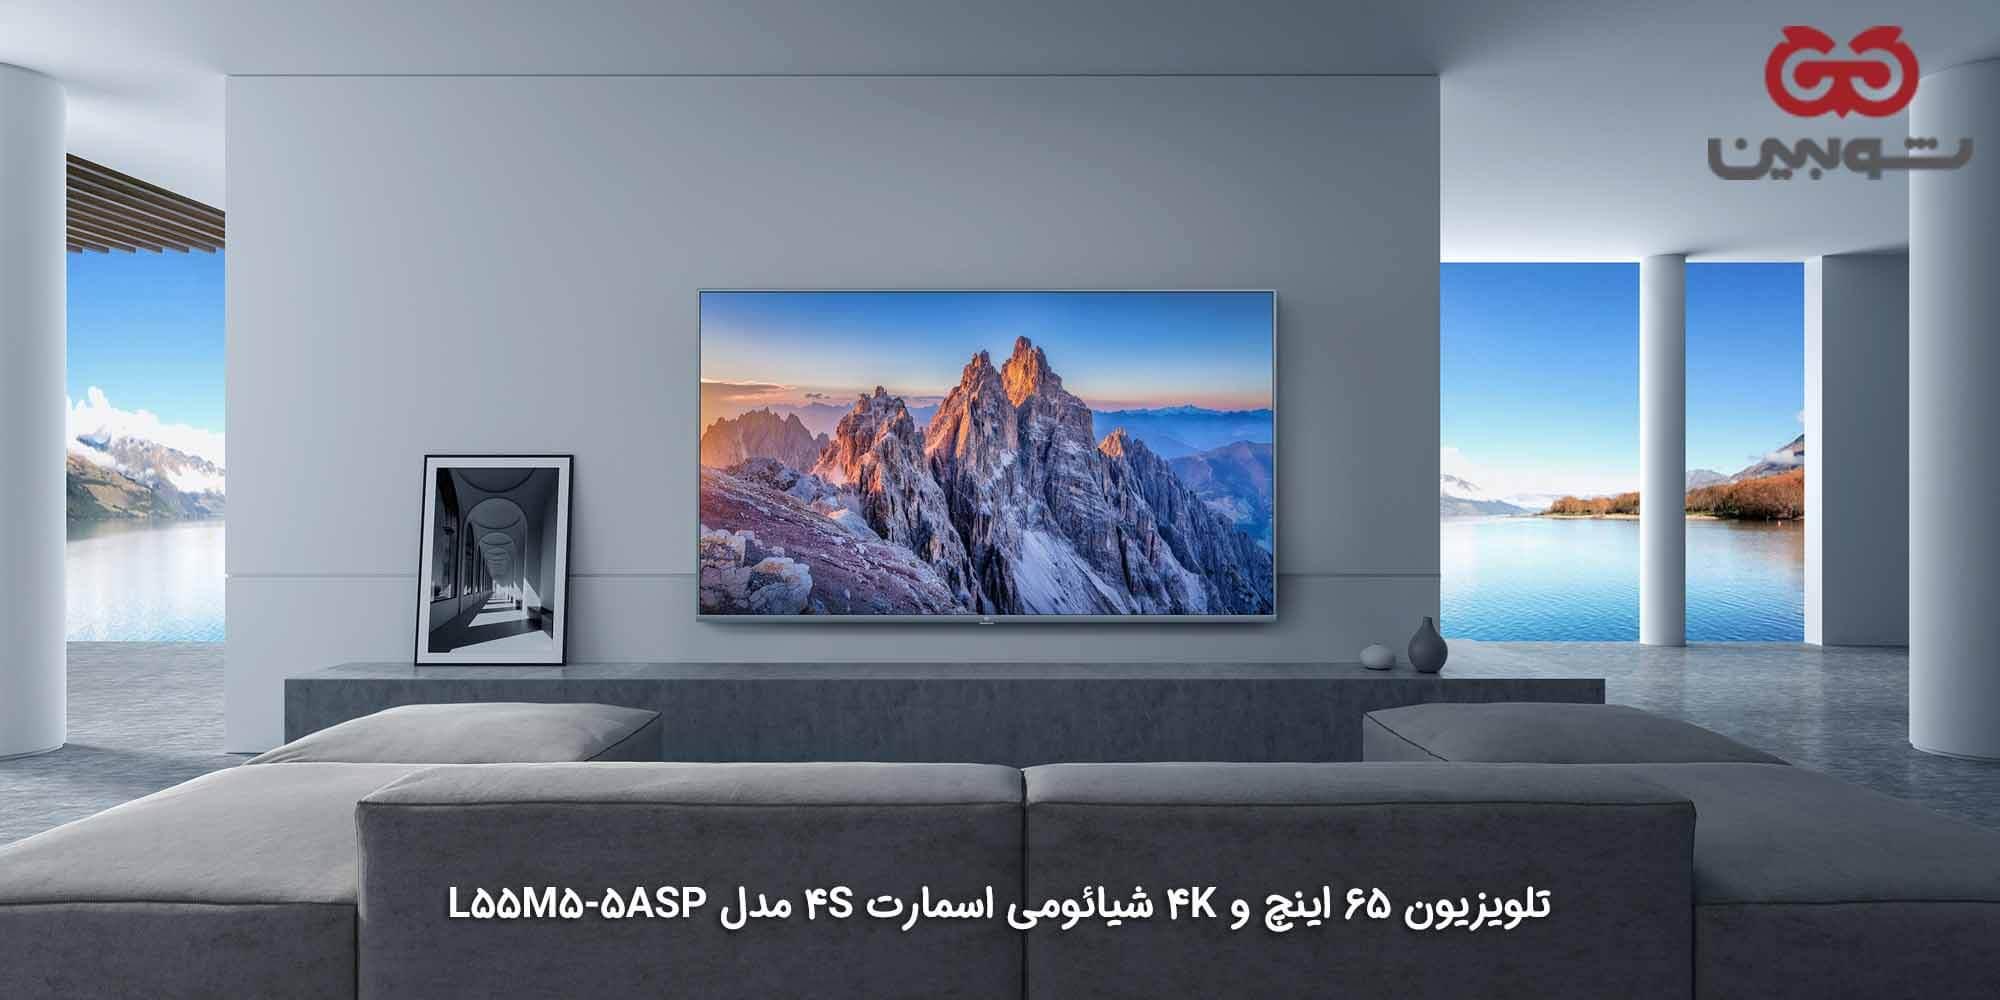 تلویزیون شیائومی 55 اینچ اسمارت 4S مدل L55M5-5ASP - عکس دوم